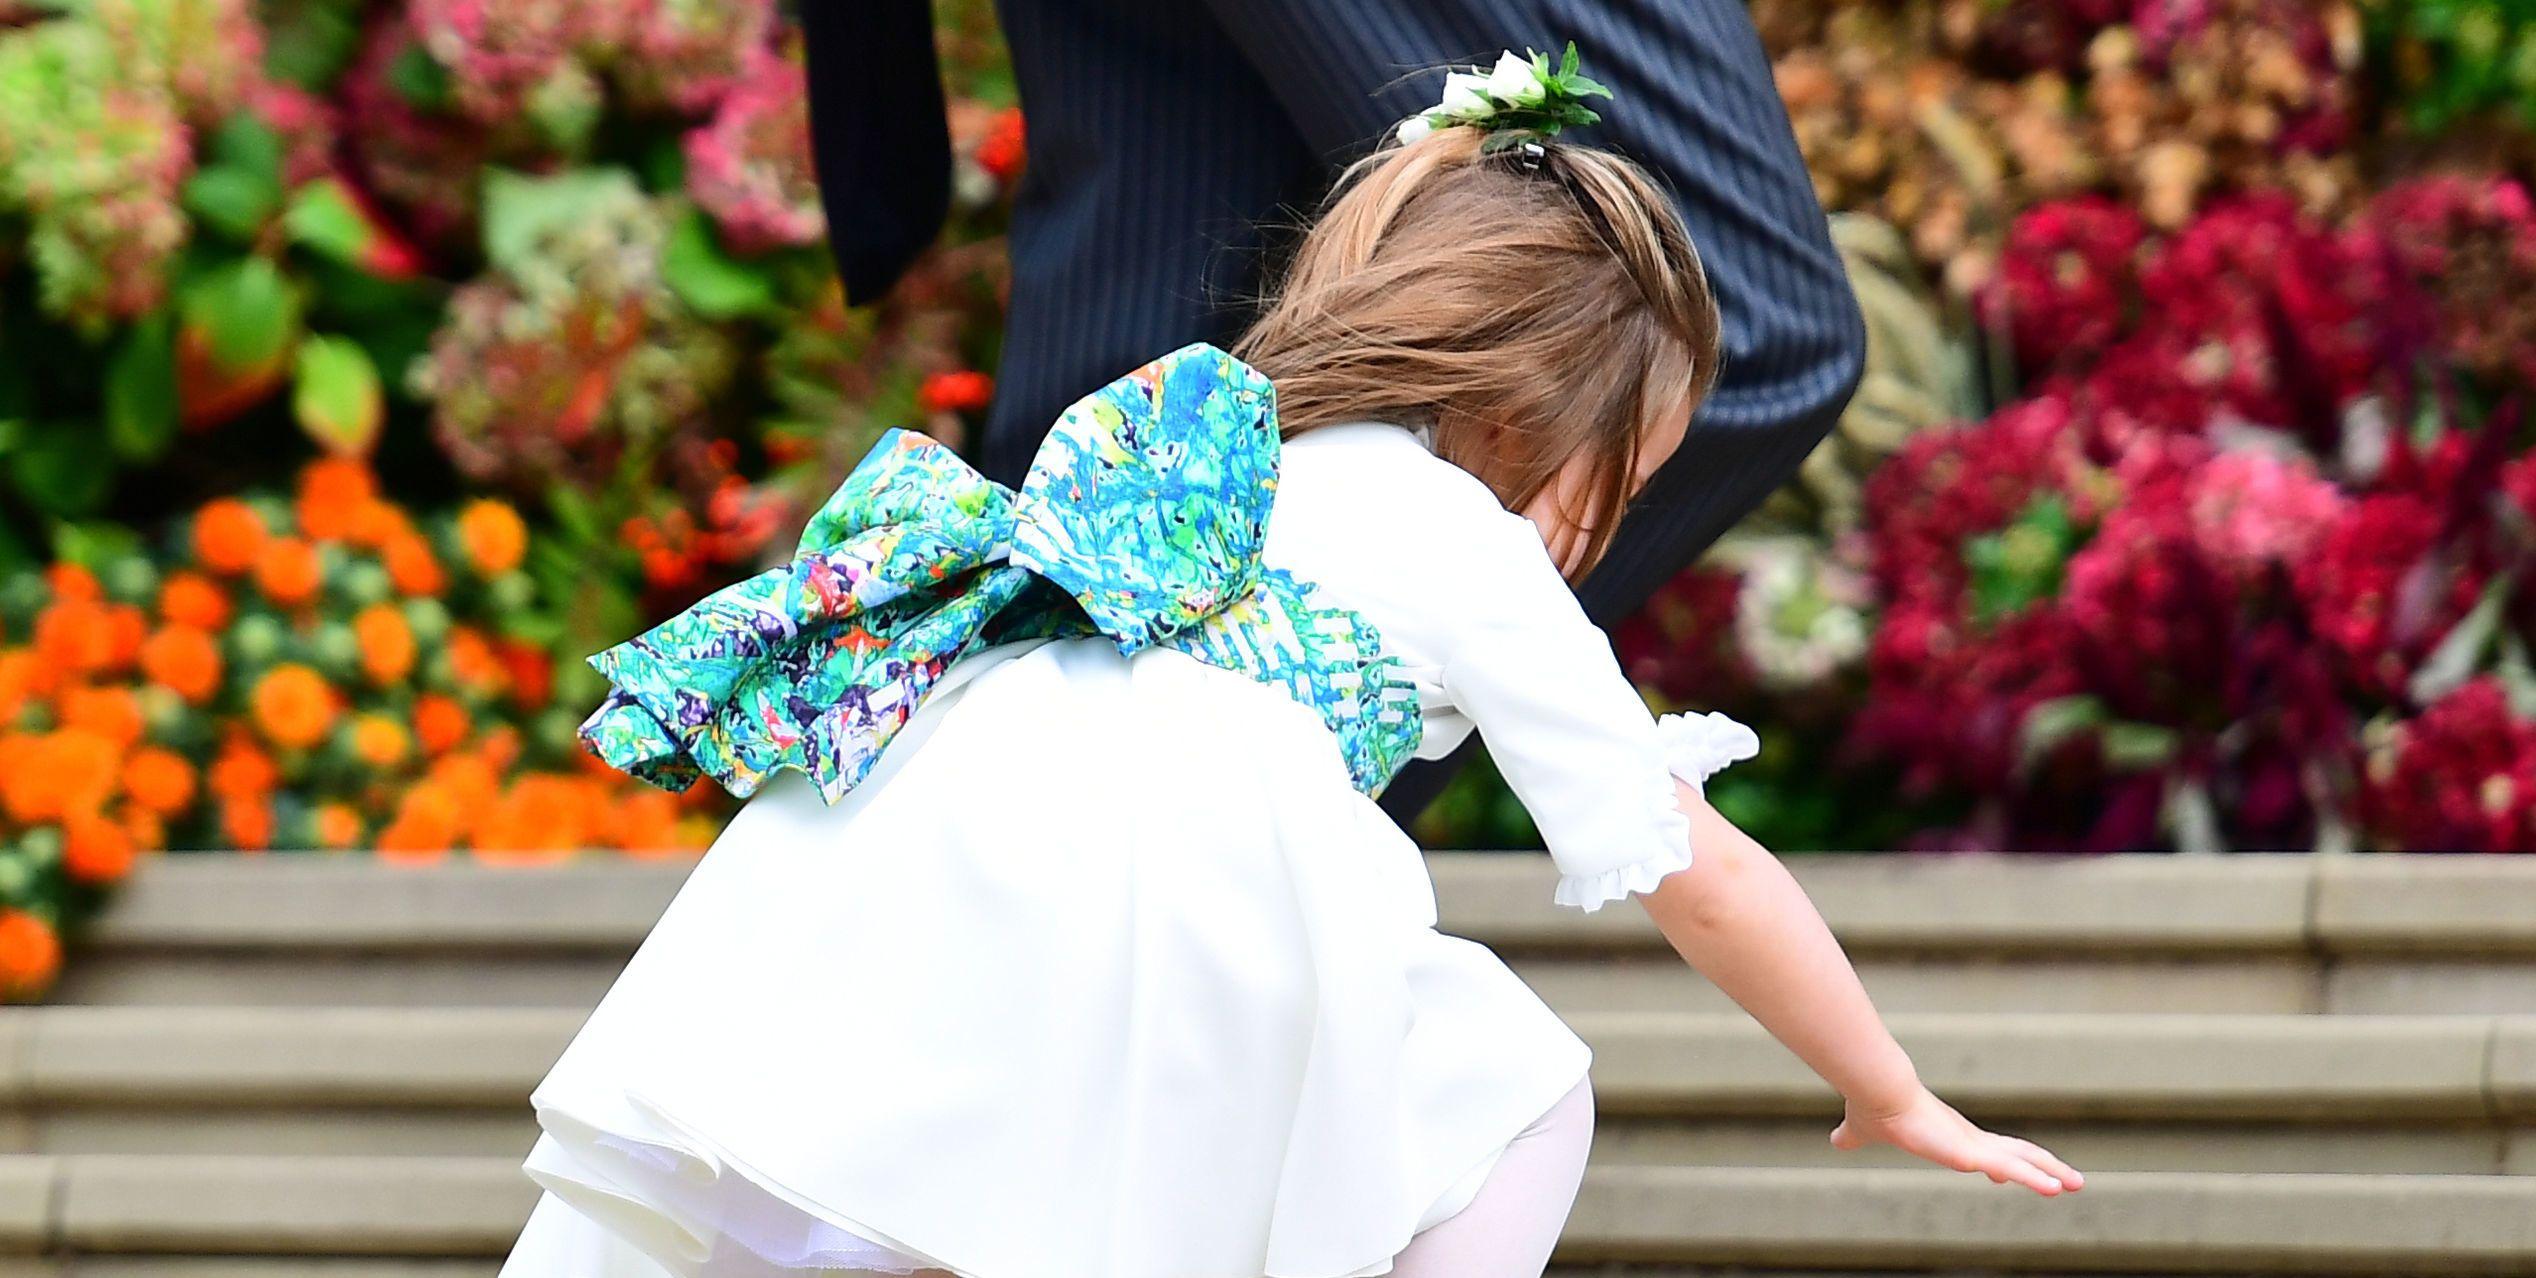 Princess Charlotte Fell on the Steps on Her Way Into Princess Eugenie's Royal Wedding